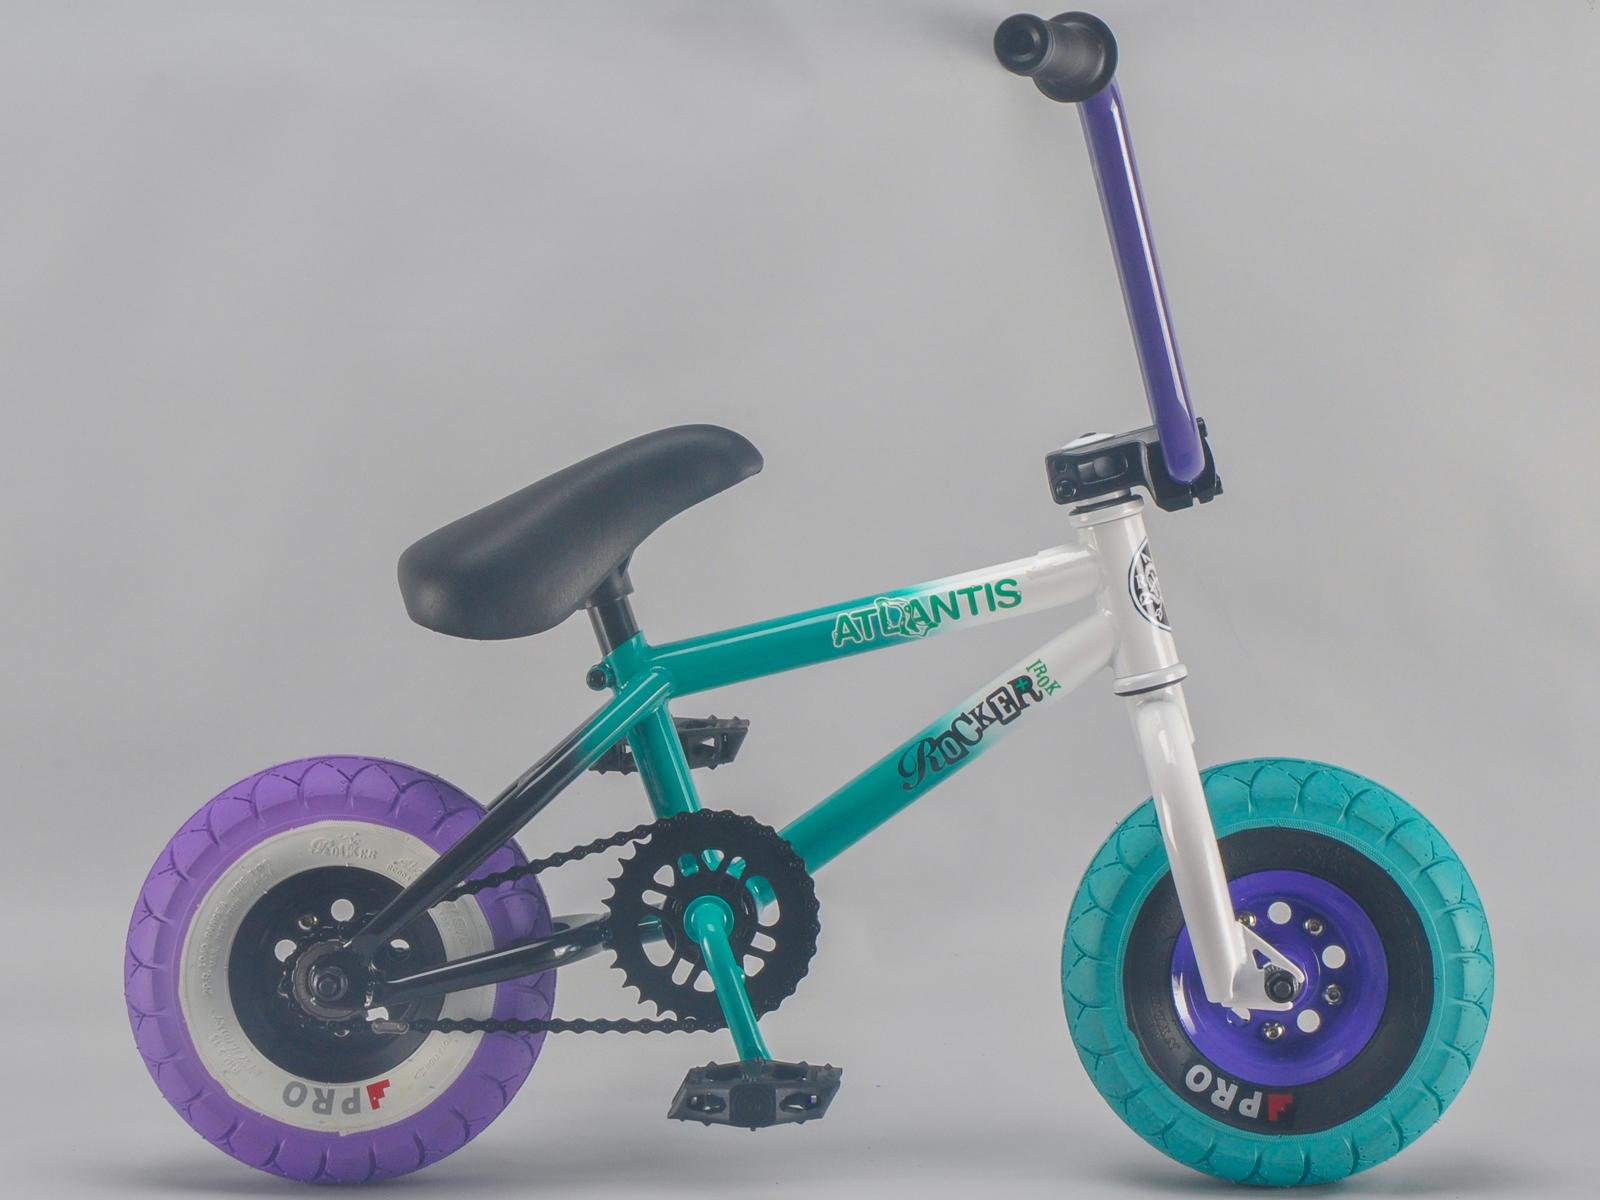 genuine rocker atlantis irok bmx rkr mini bmx bike. Black Bedroom Furniture Sets. Home Design Ideas